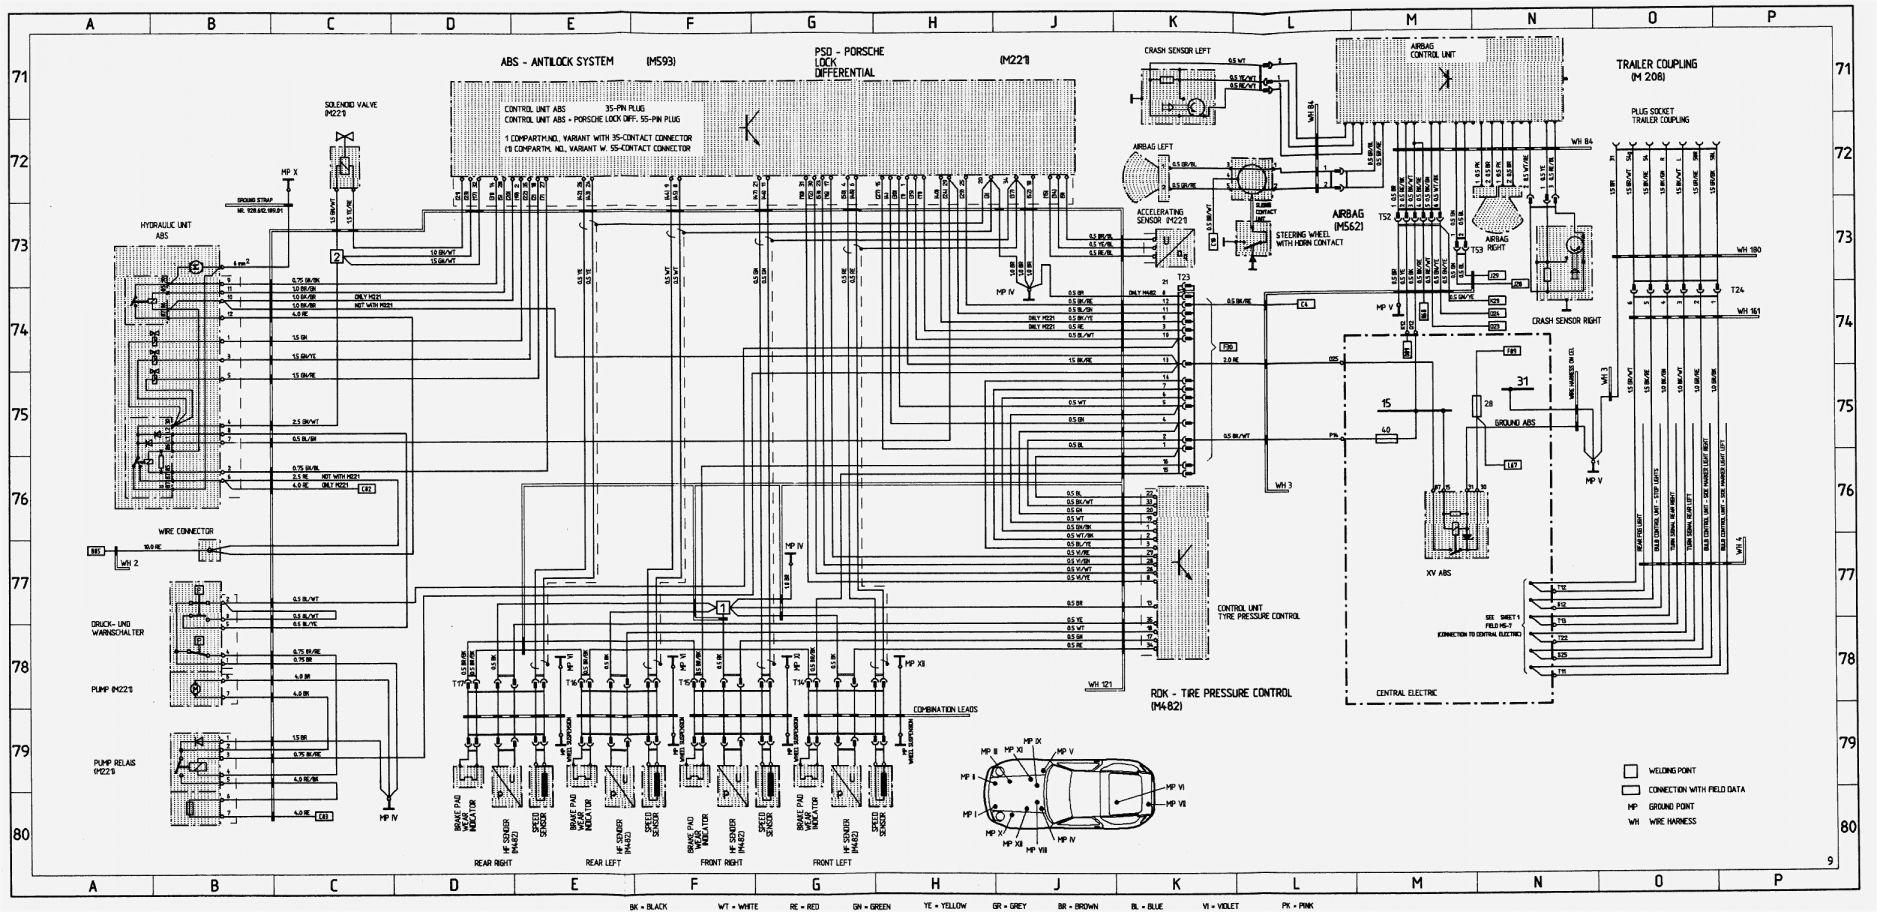 bmw e23 wiring diagram bmw wiring diagrams e90 wiring diagram data  bmw wiring diagrams e90 wiring